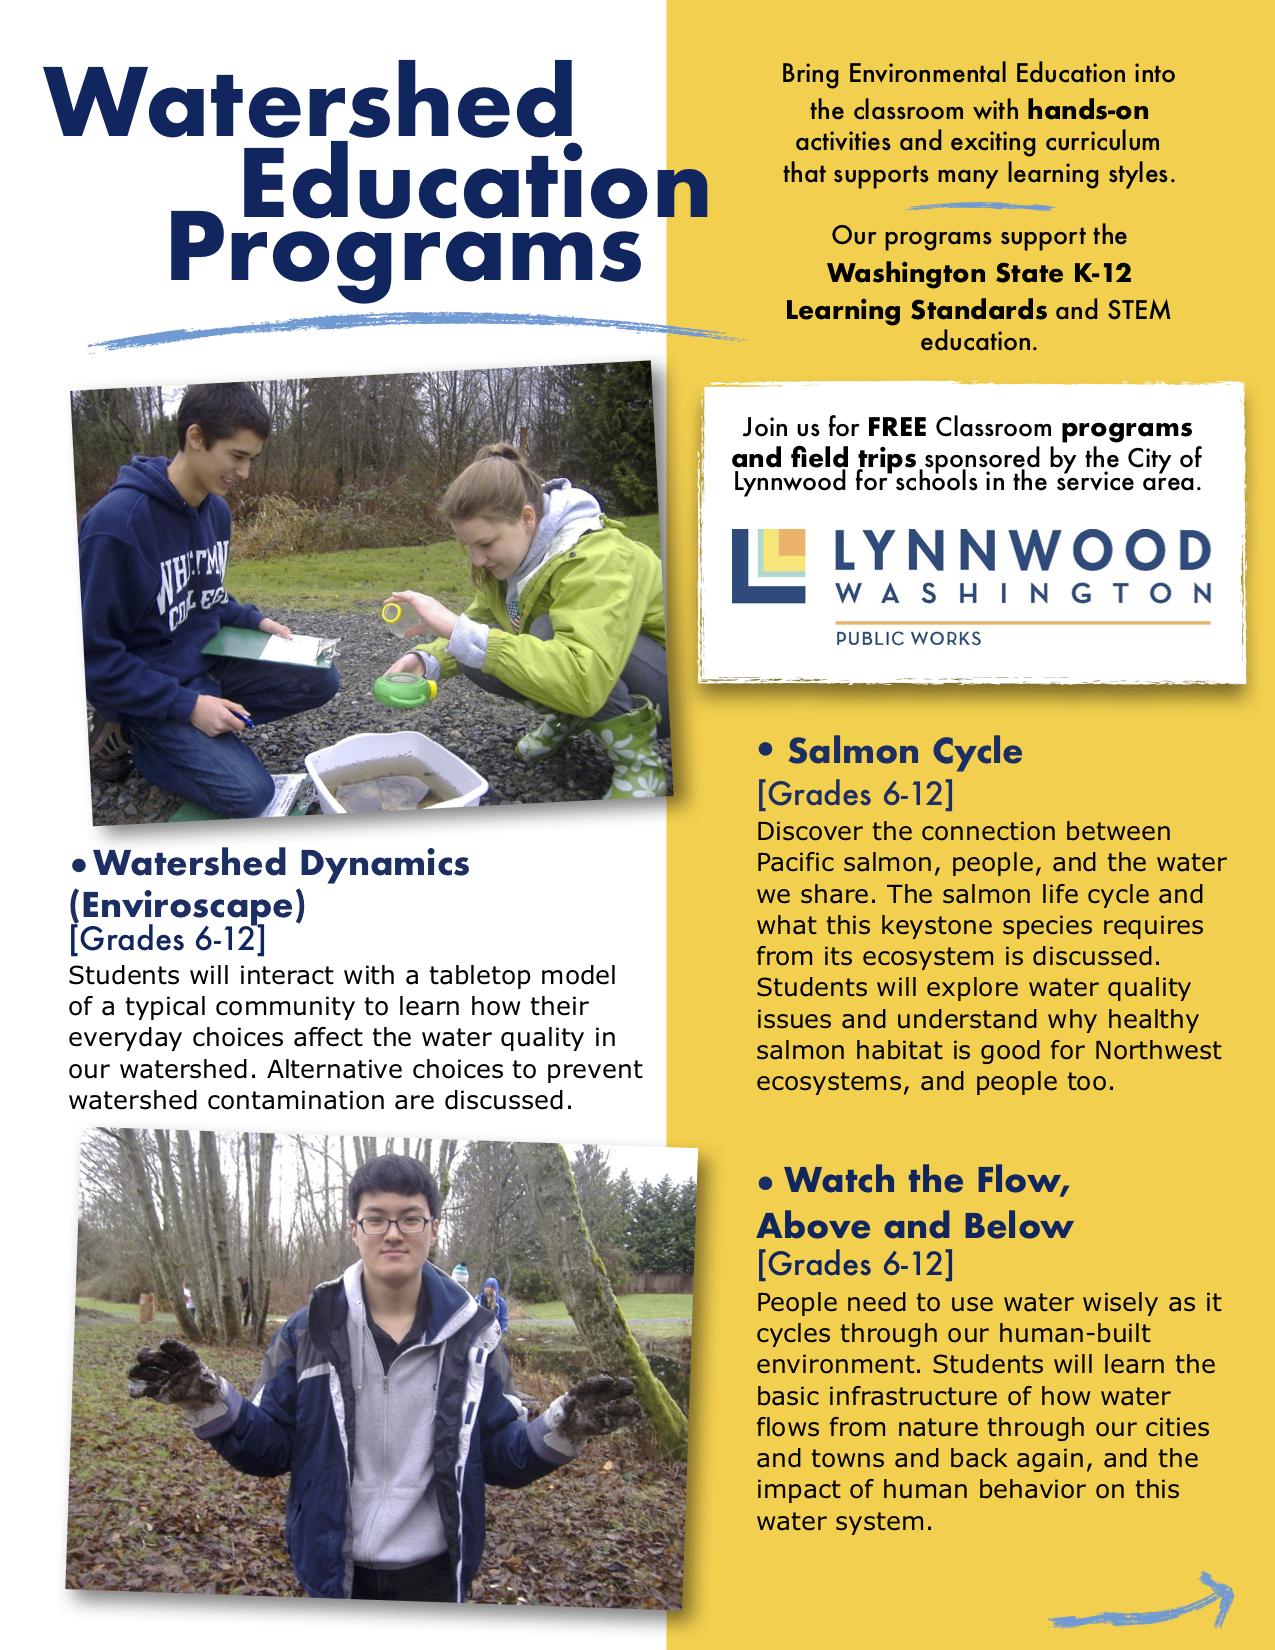 City of Lynnwood - Secondary